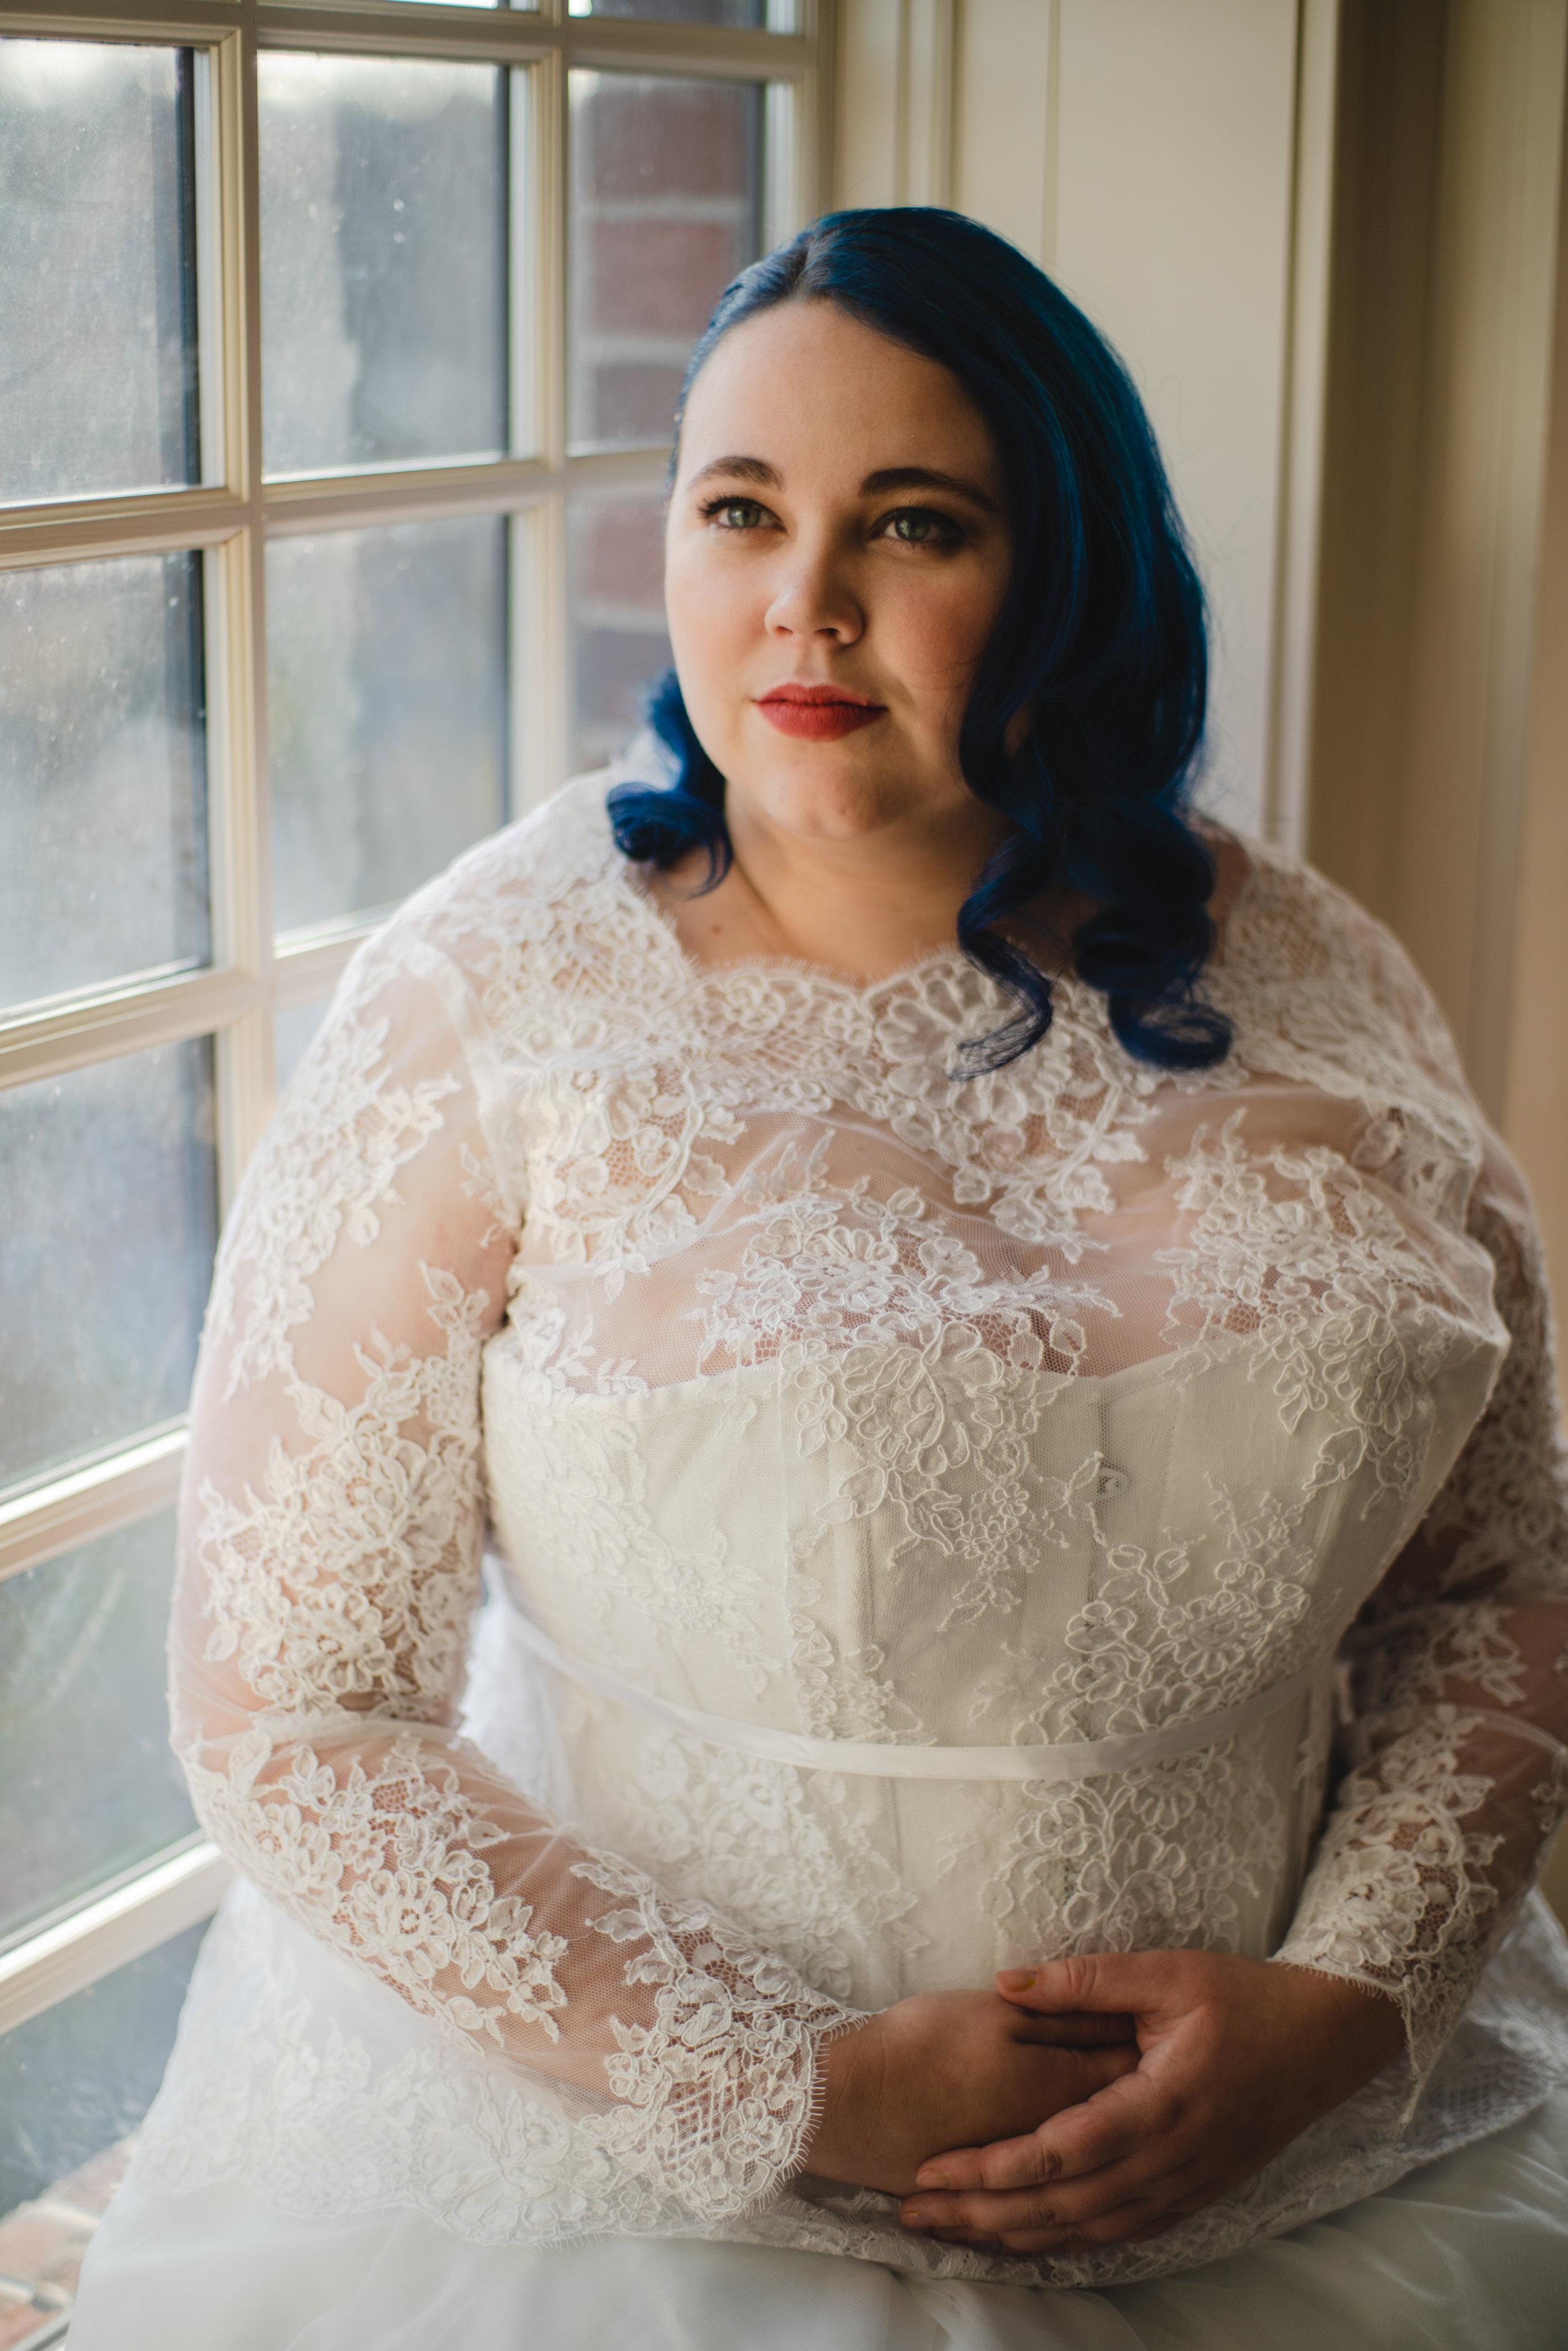 DSC00371.ARWRobin&matt_wedding_Danny11-11-20186590.jpg